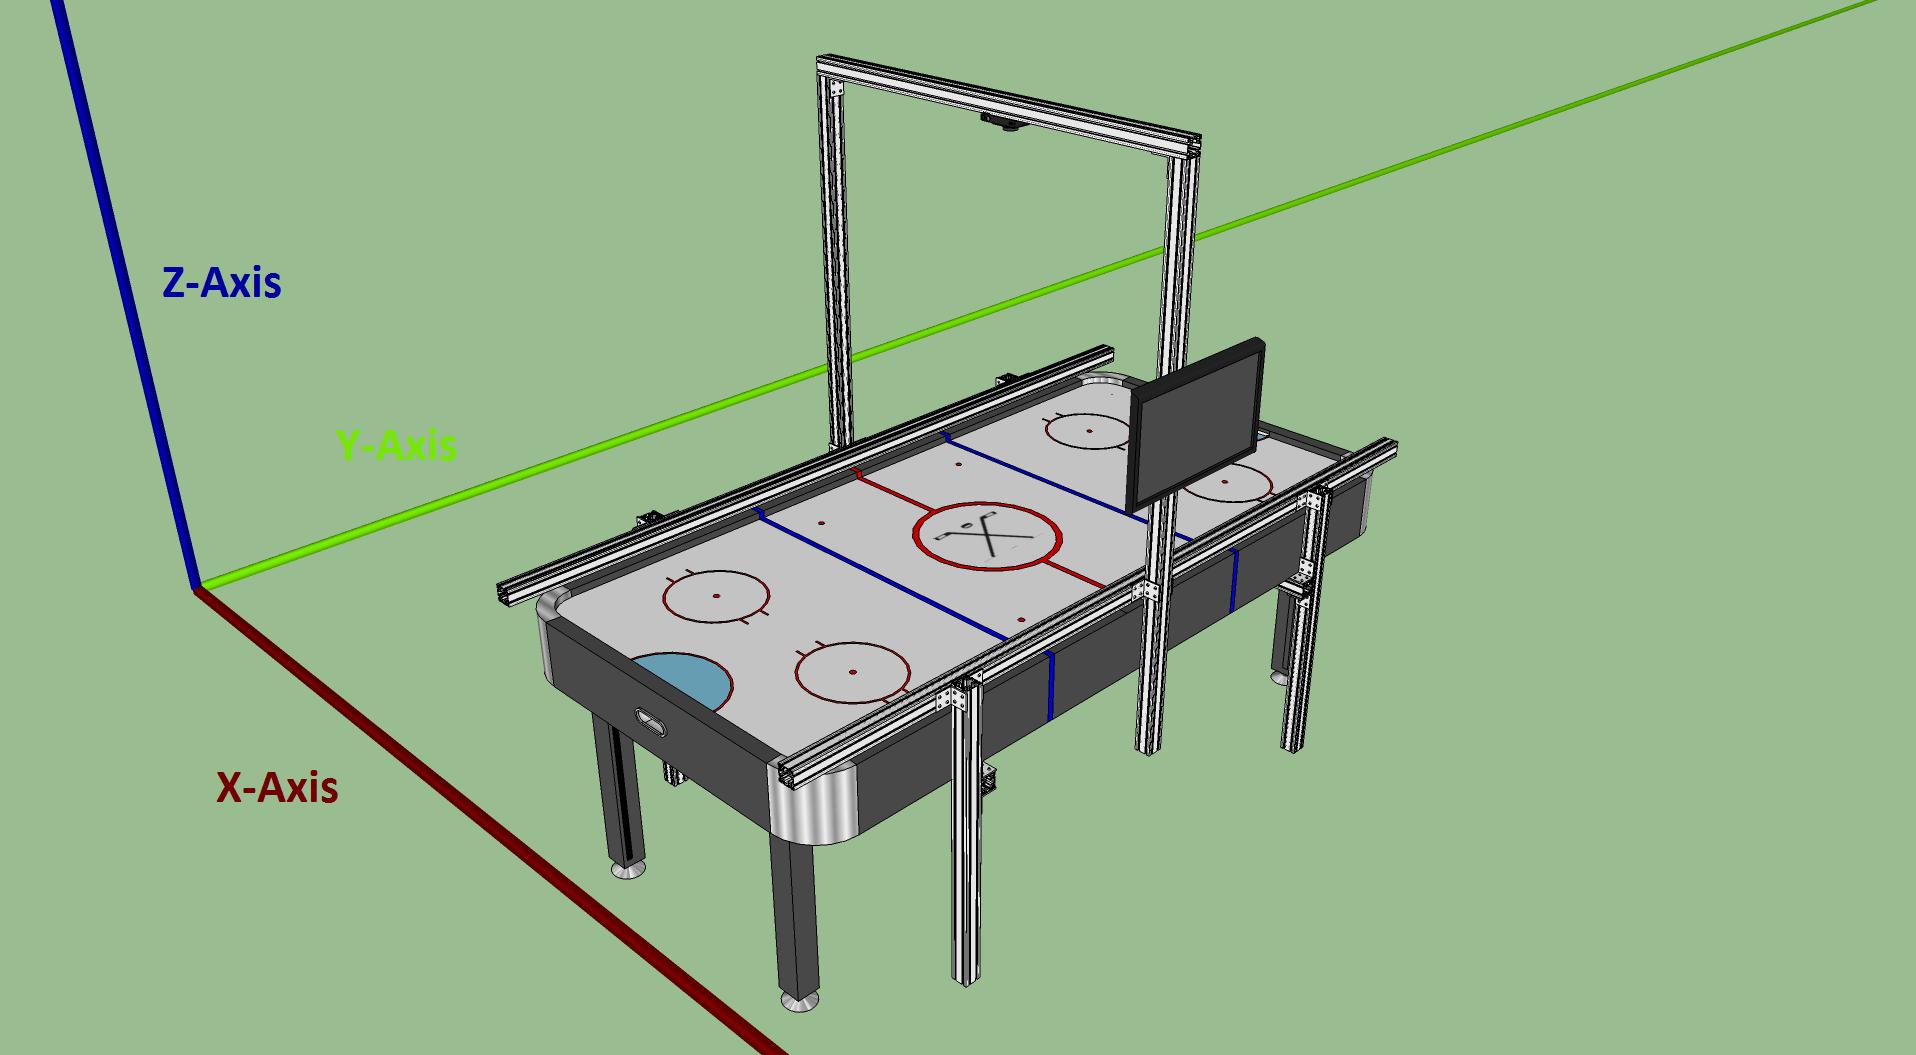 Air hockey schematics wiring diagrams create wiring diagrams rhino air hockey table wiring diagram images wiring table and tablerender rhino air hockey table wiring keyboard keysfo Gallery